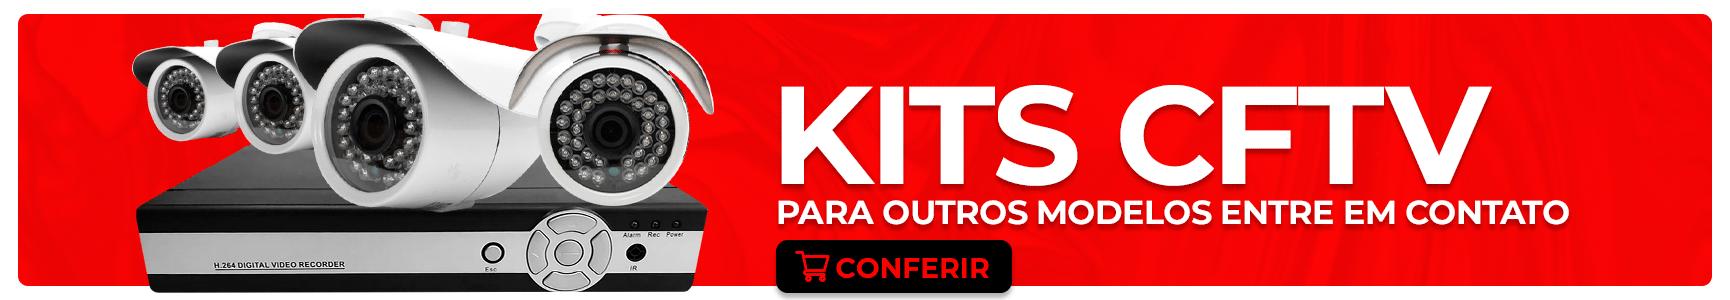 KITs CFTV